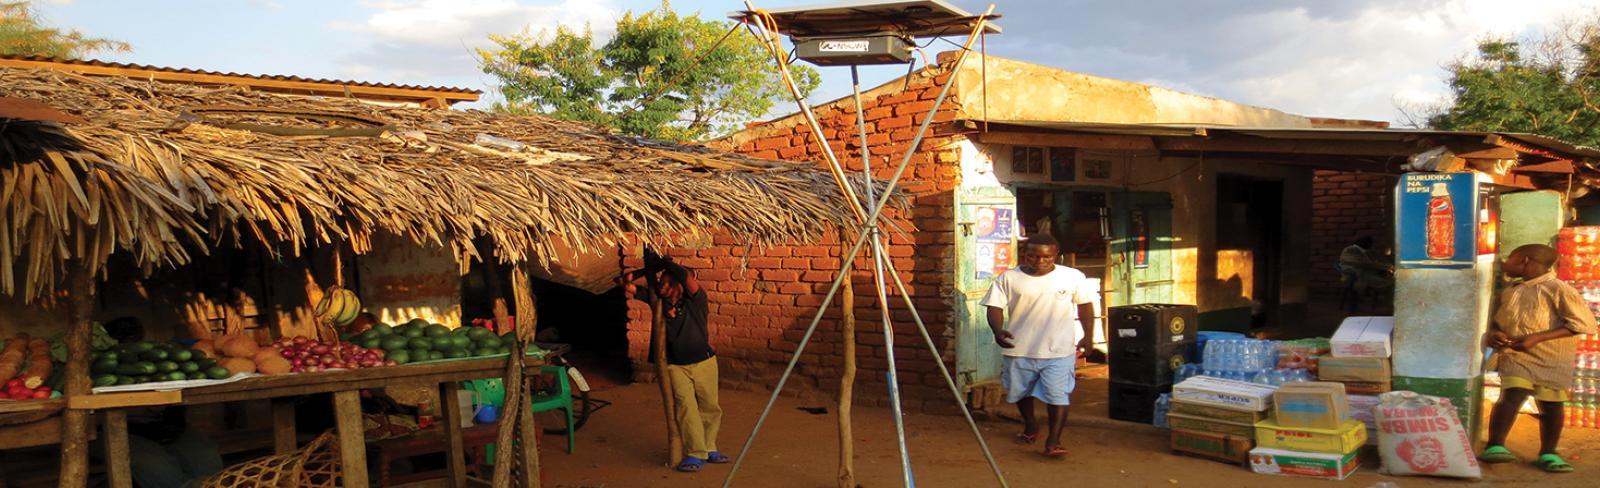 microgrid_Tanzania_IMG_0381_StephanieNsom